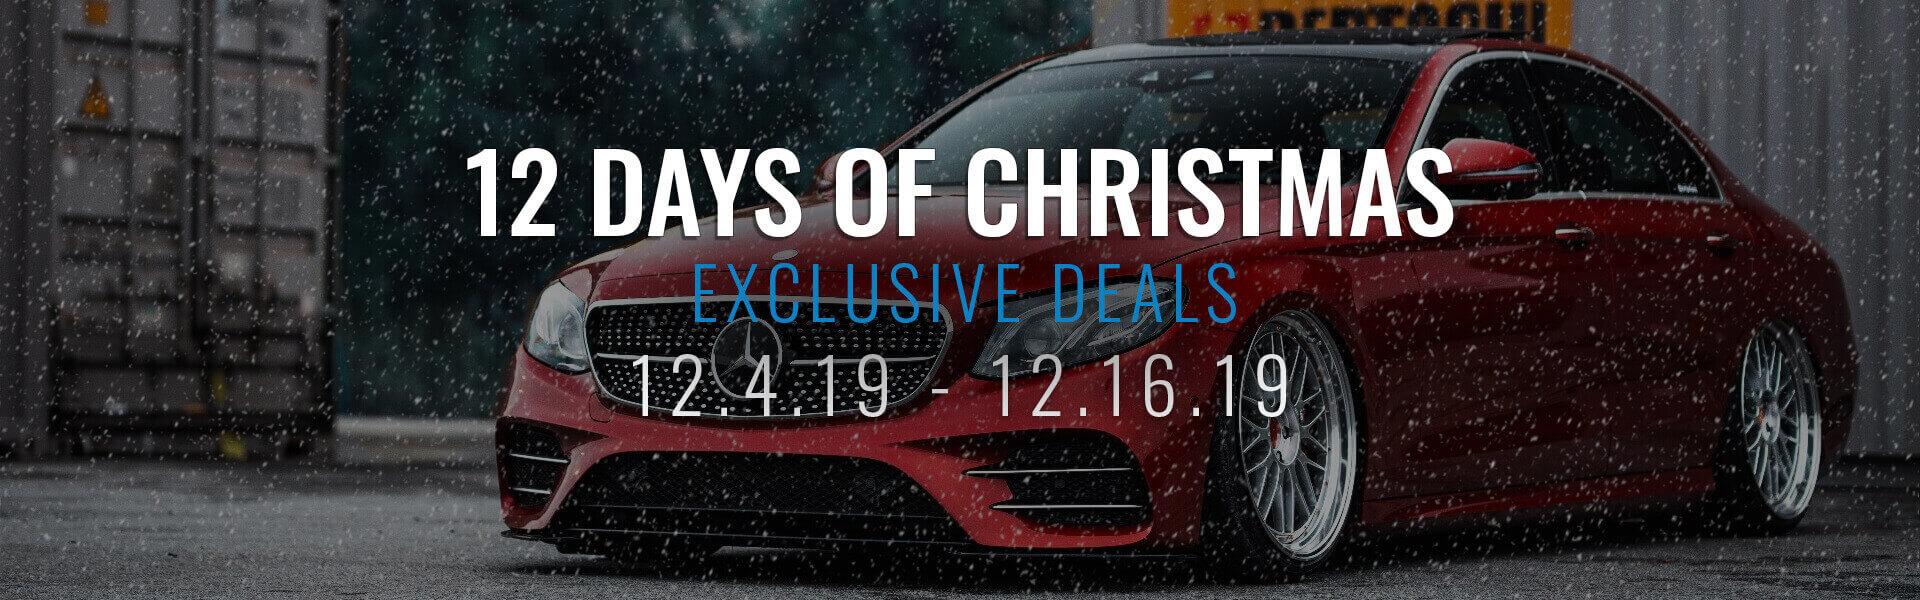 12 Days of Christmas Sale Banner